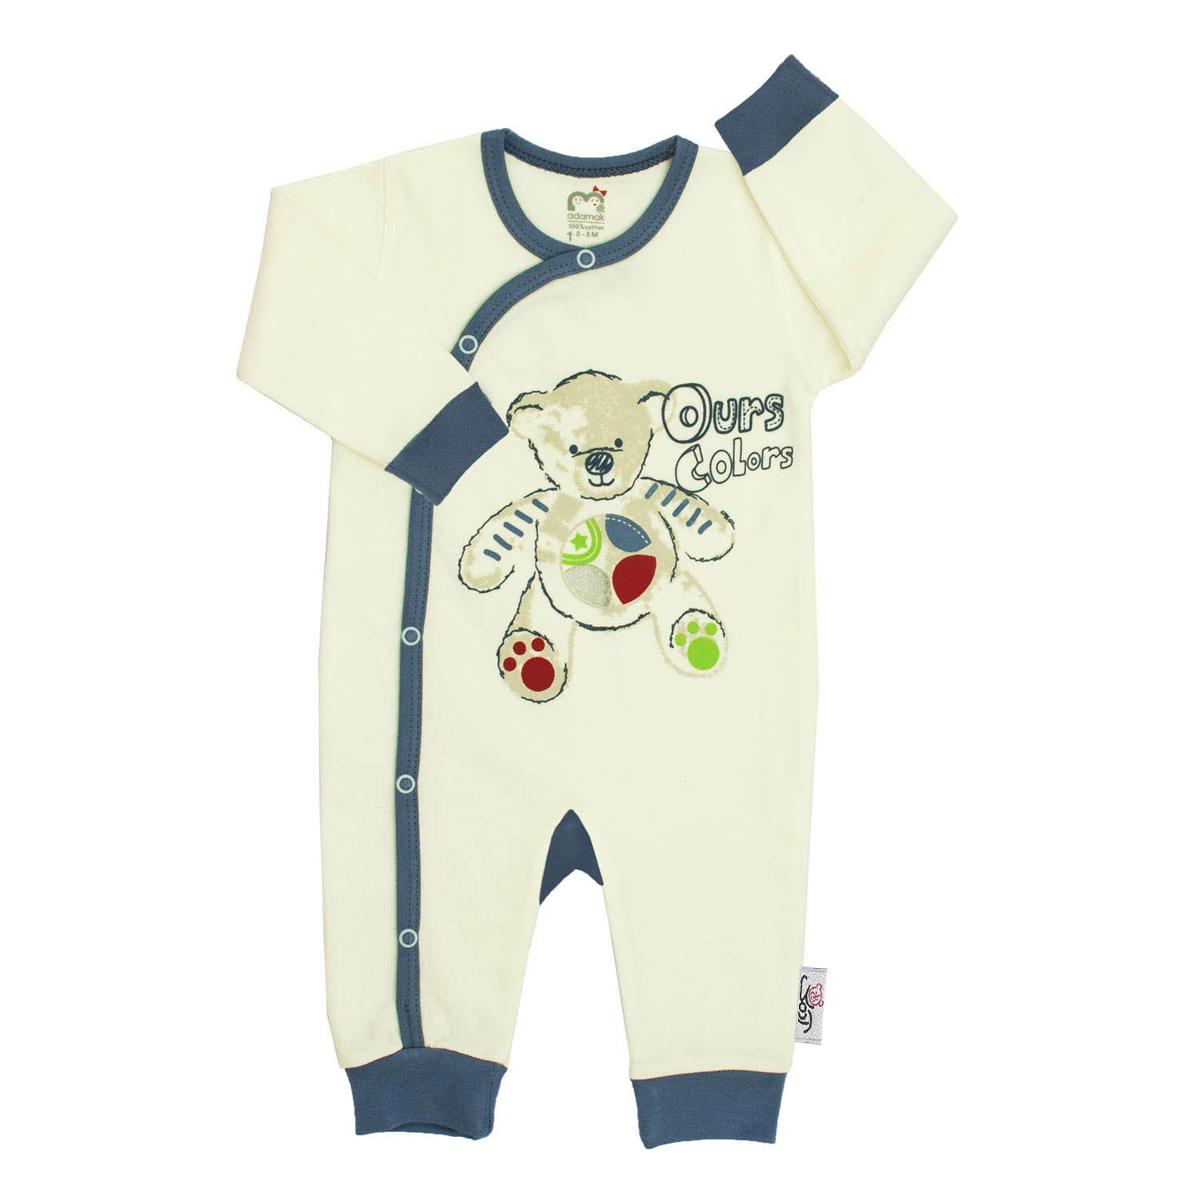 سرهمی نوزادی آدمک طرح تدی کد 46250